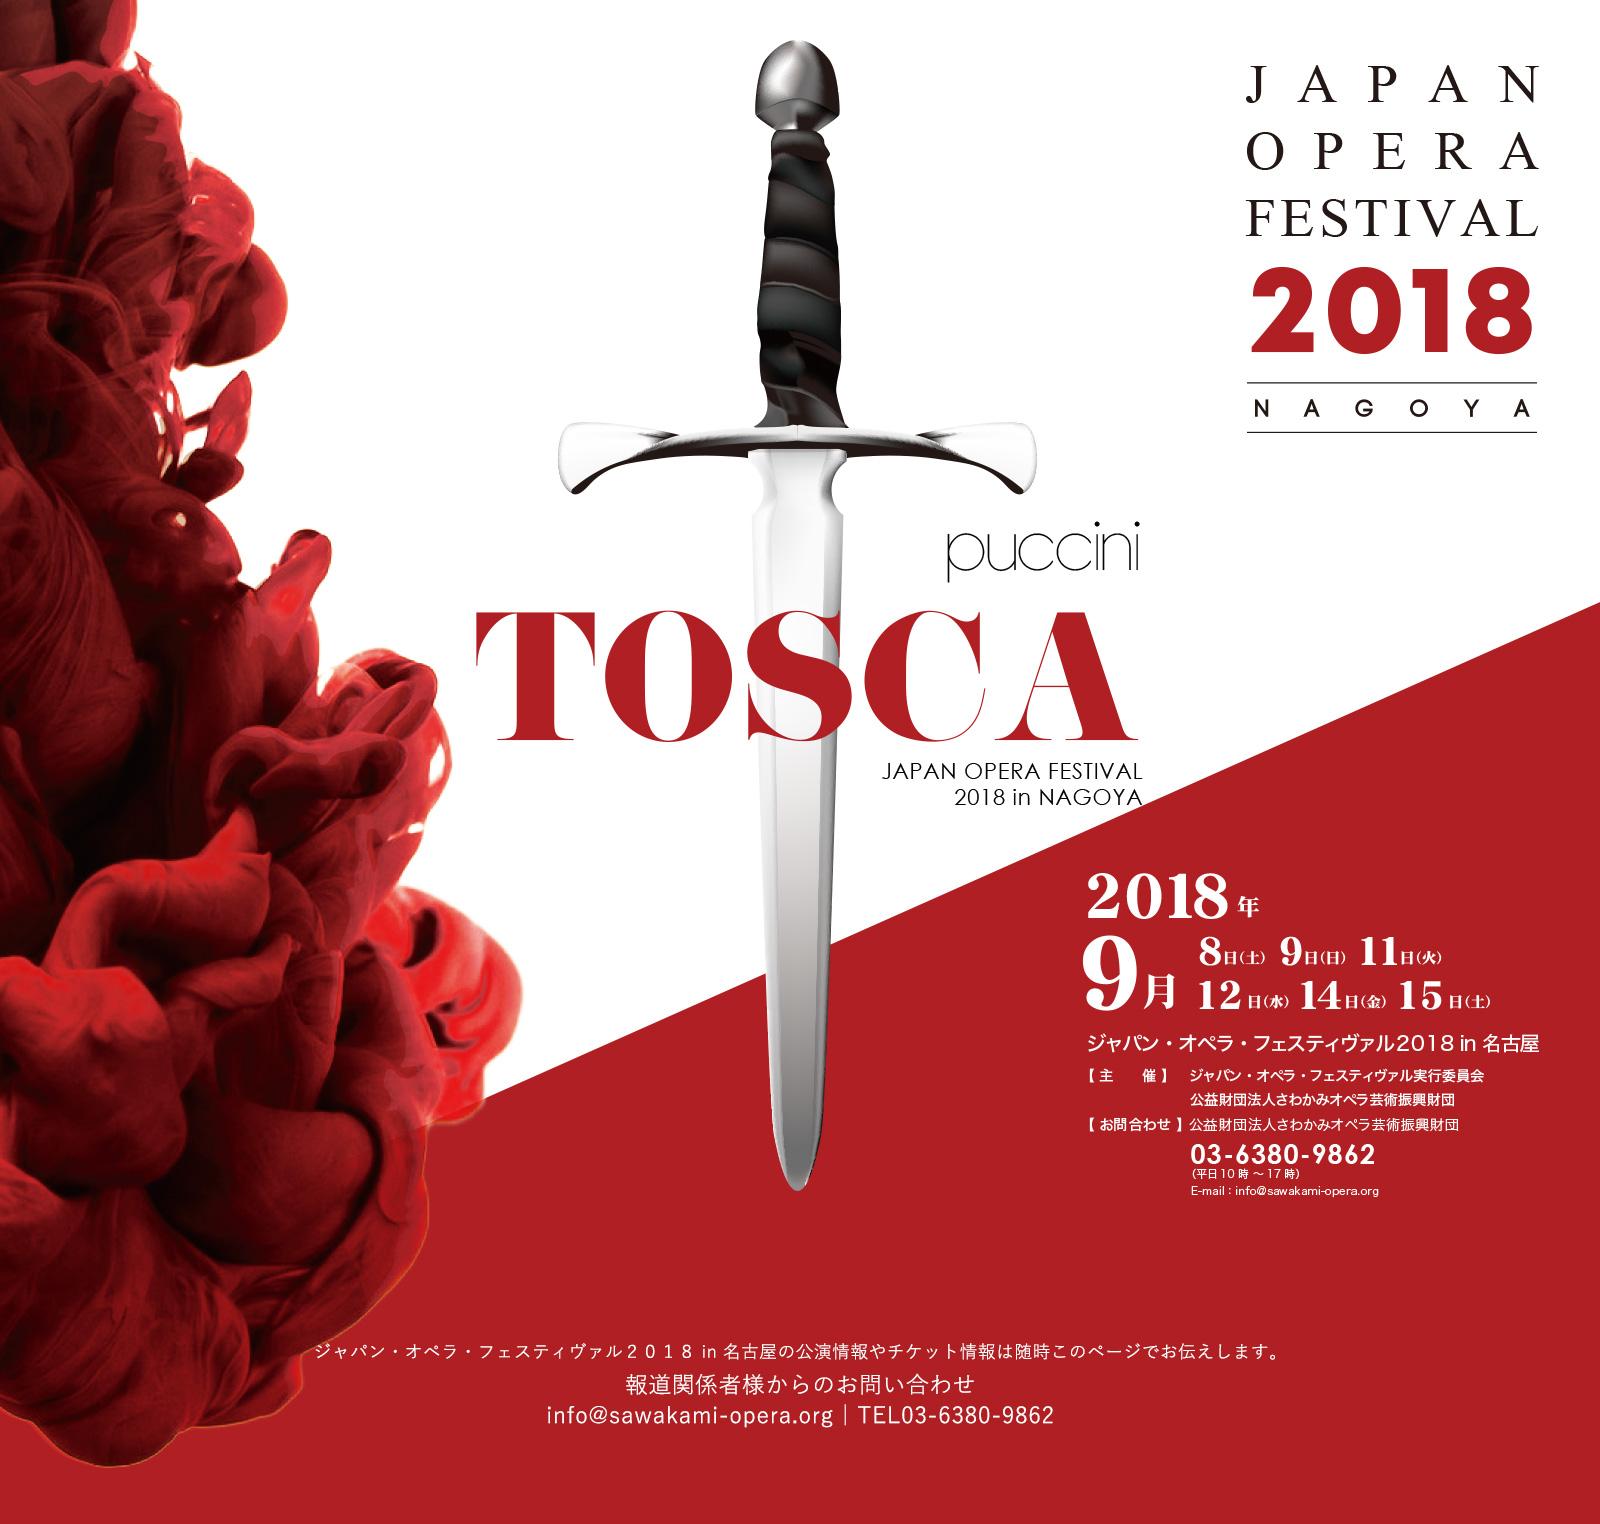 TOSCA トスカ オペラの公演情報